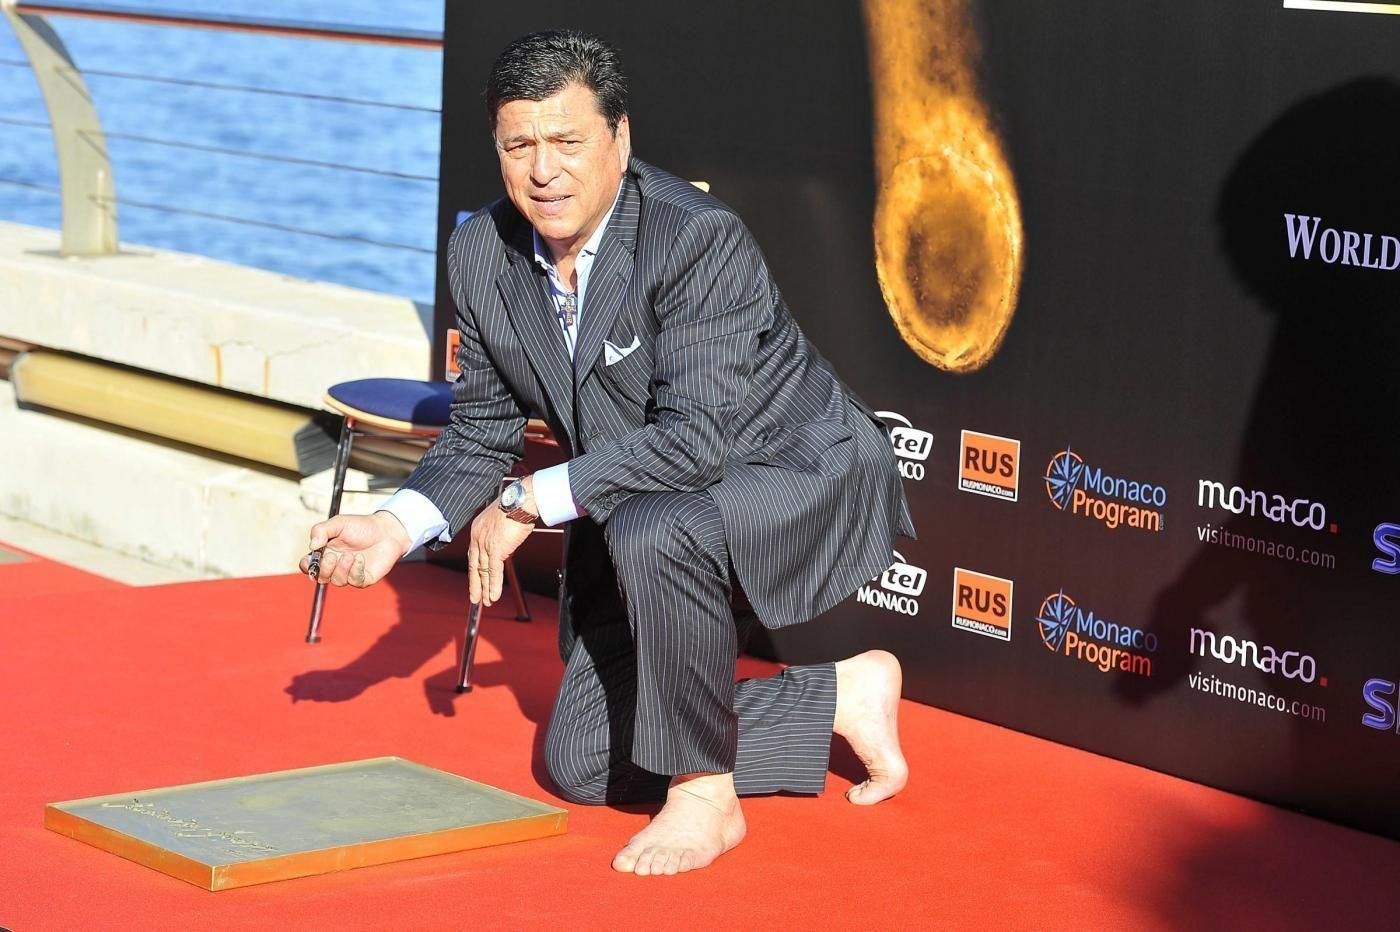 GOLDEN FOOT AWARD MONACO 2015 Footprint Ceremony